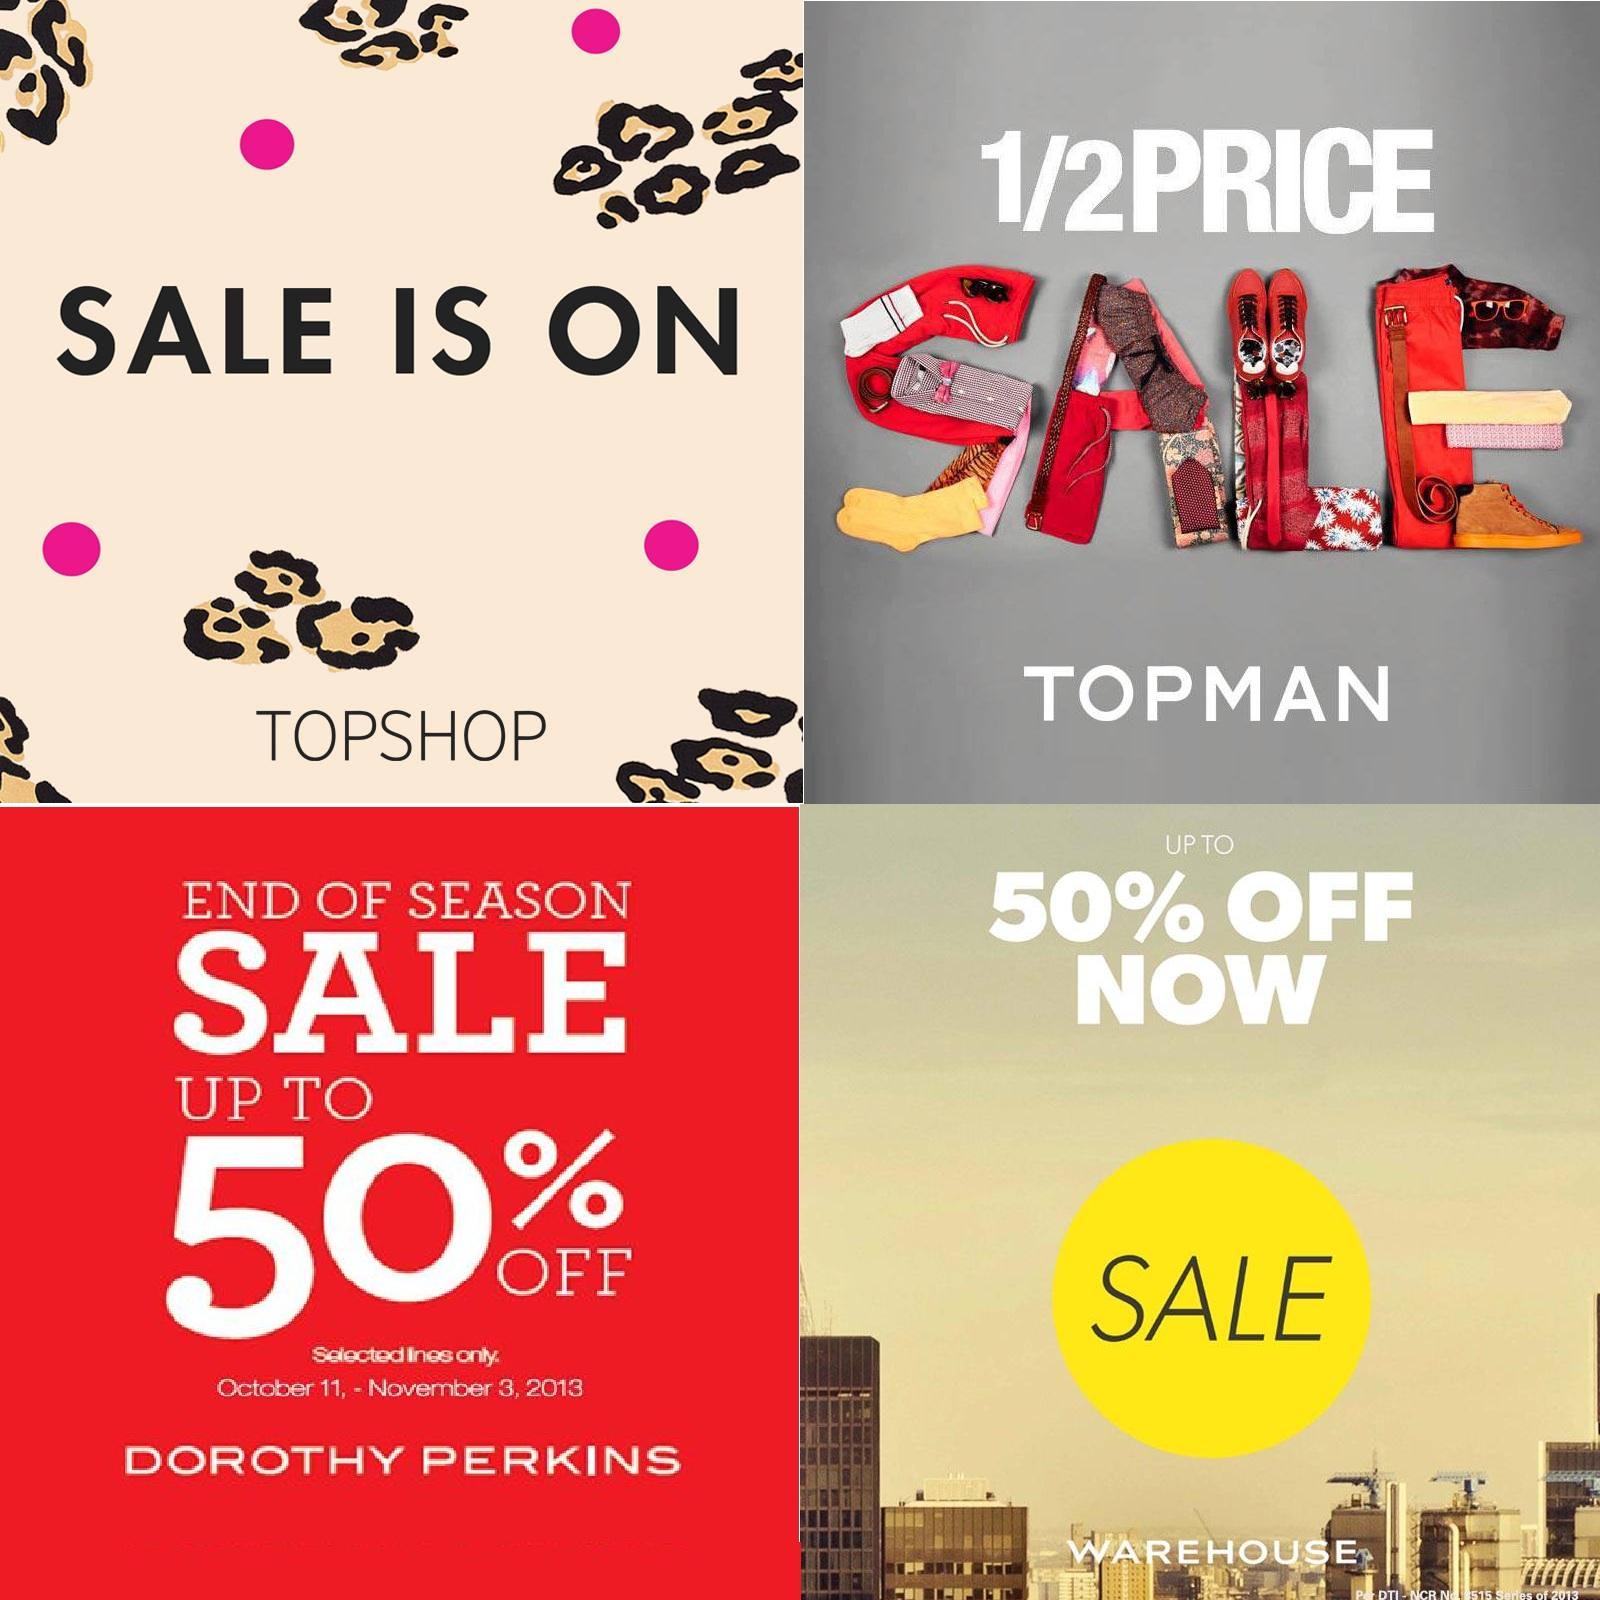 Topshop, Topman, Dorothy Perkins, Warehouse Mid-Season Sale October - November 2013